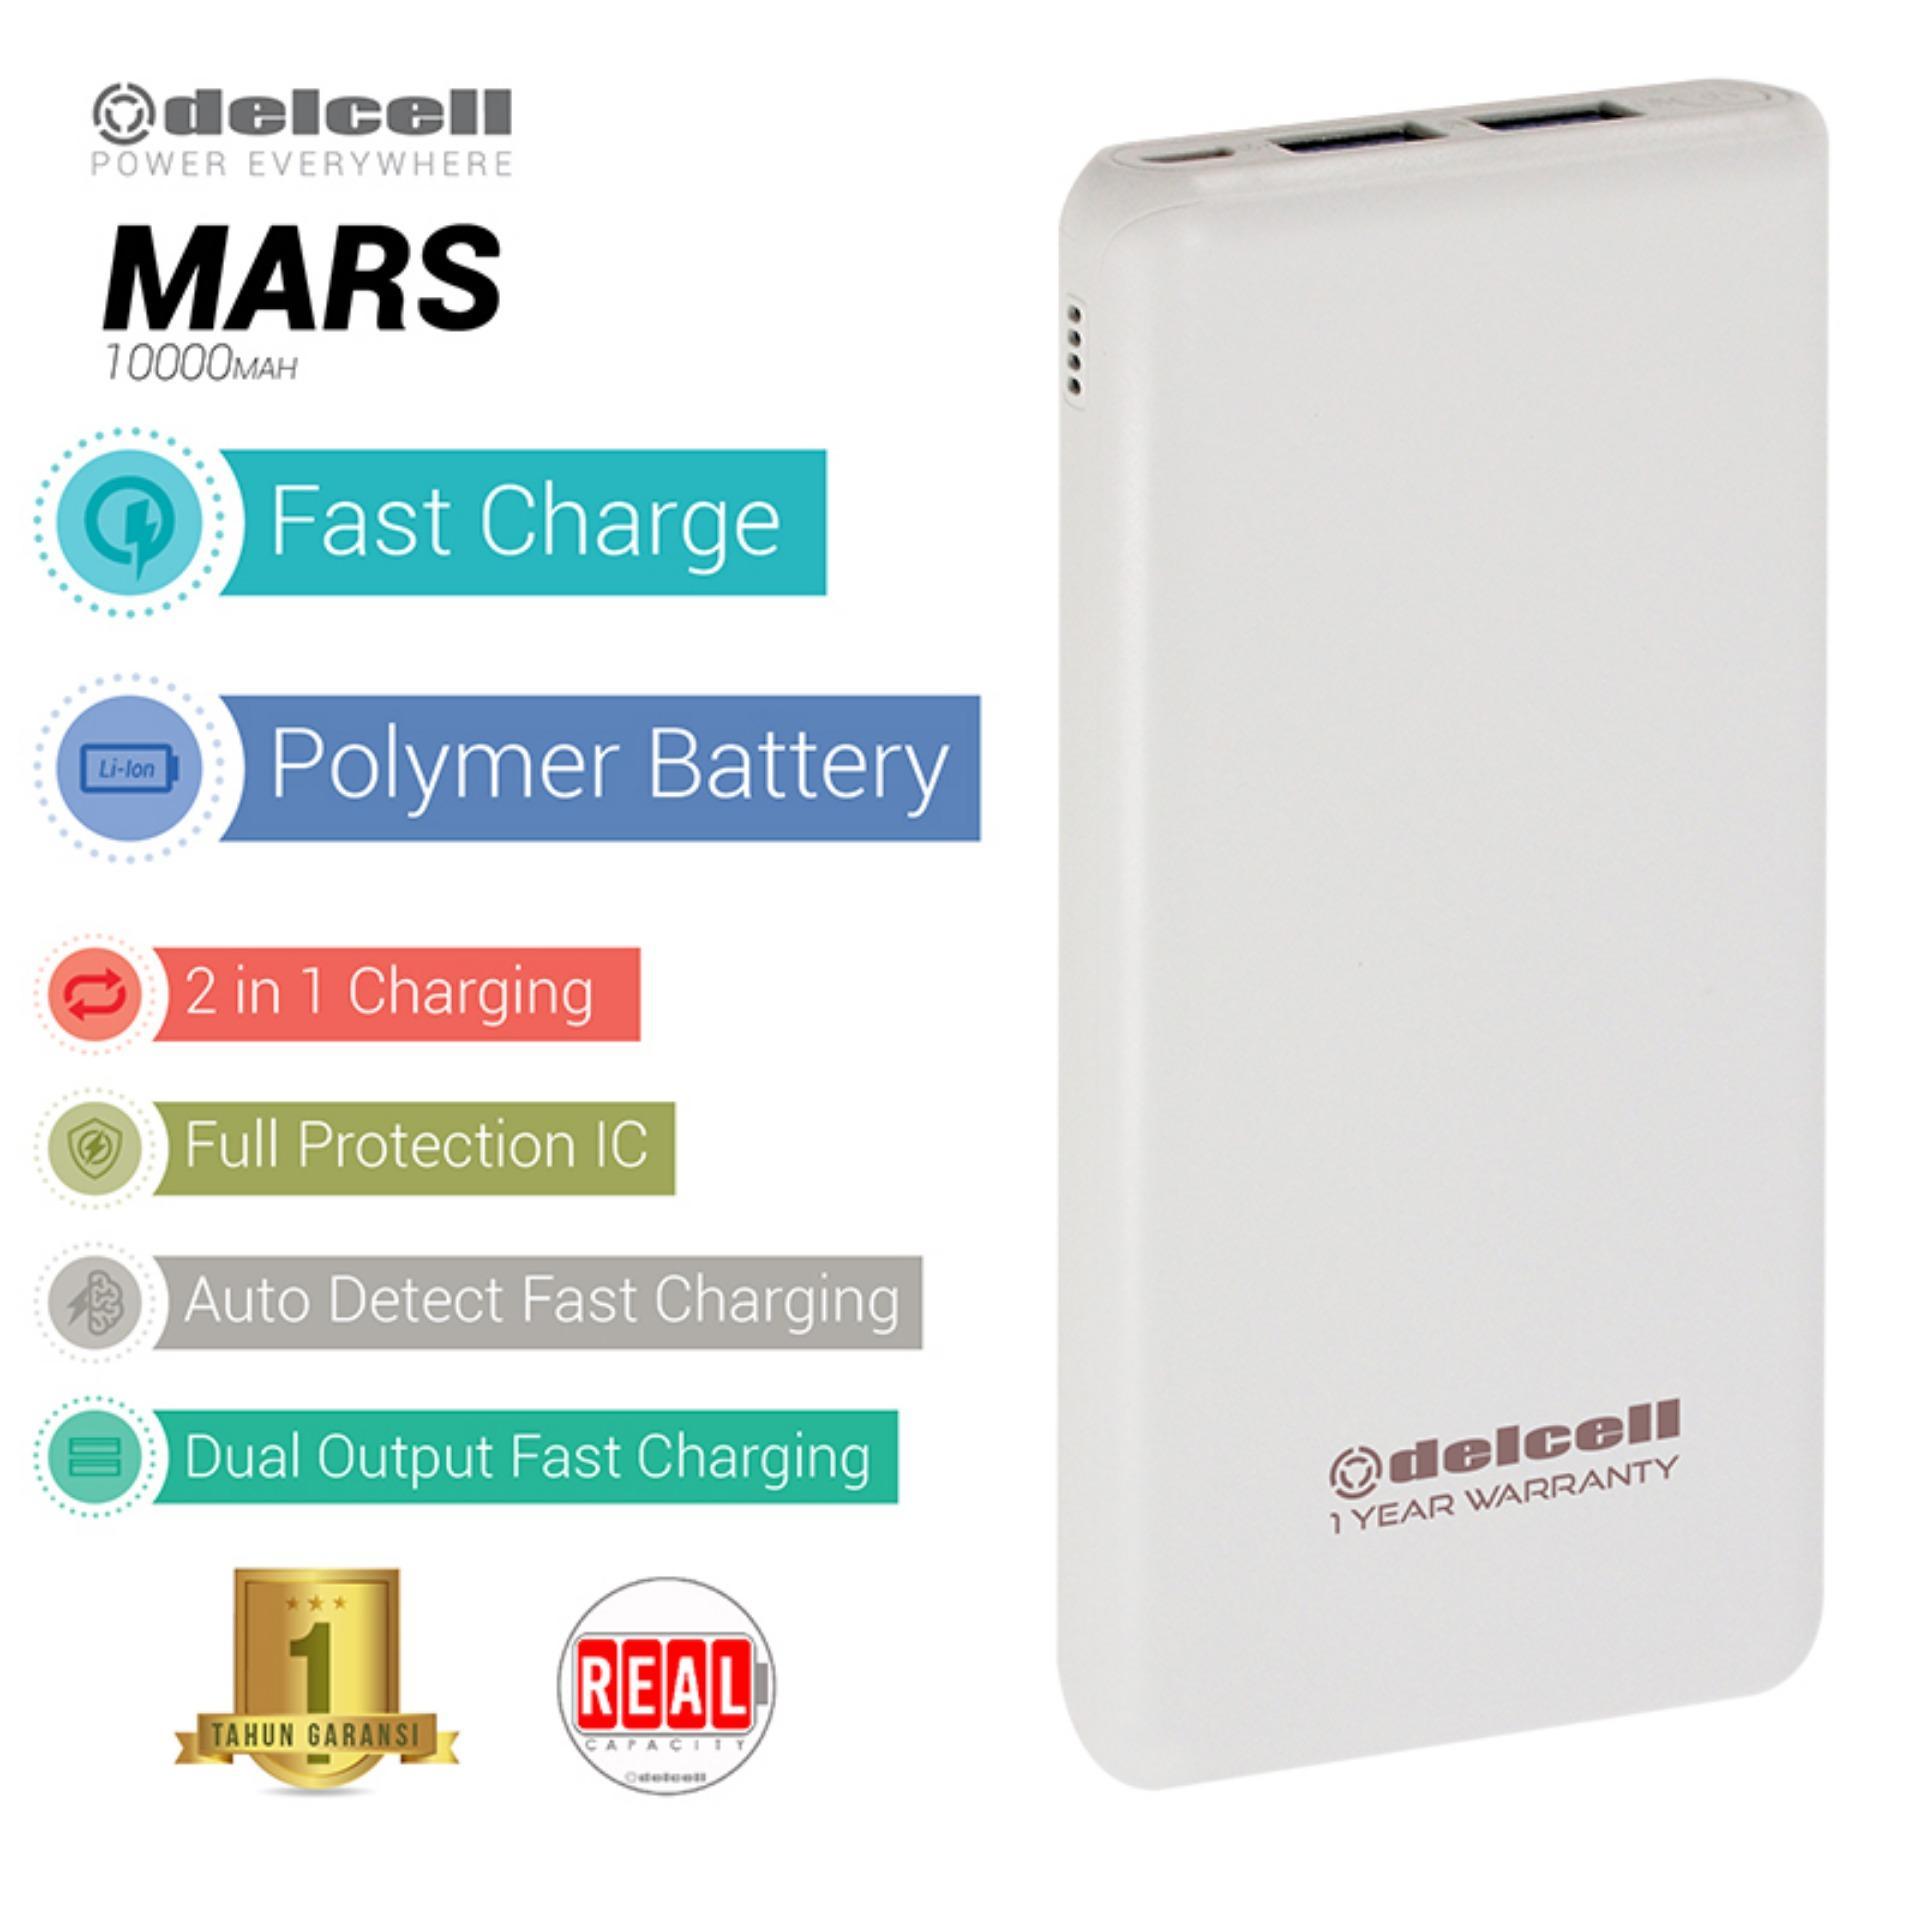 Delcell 10000mAh Powerbank MARS Real Capacity Fast Charging Slim Powerbank Polymer Battery Dual Output Garansi Resmi